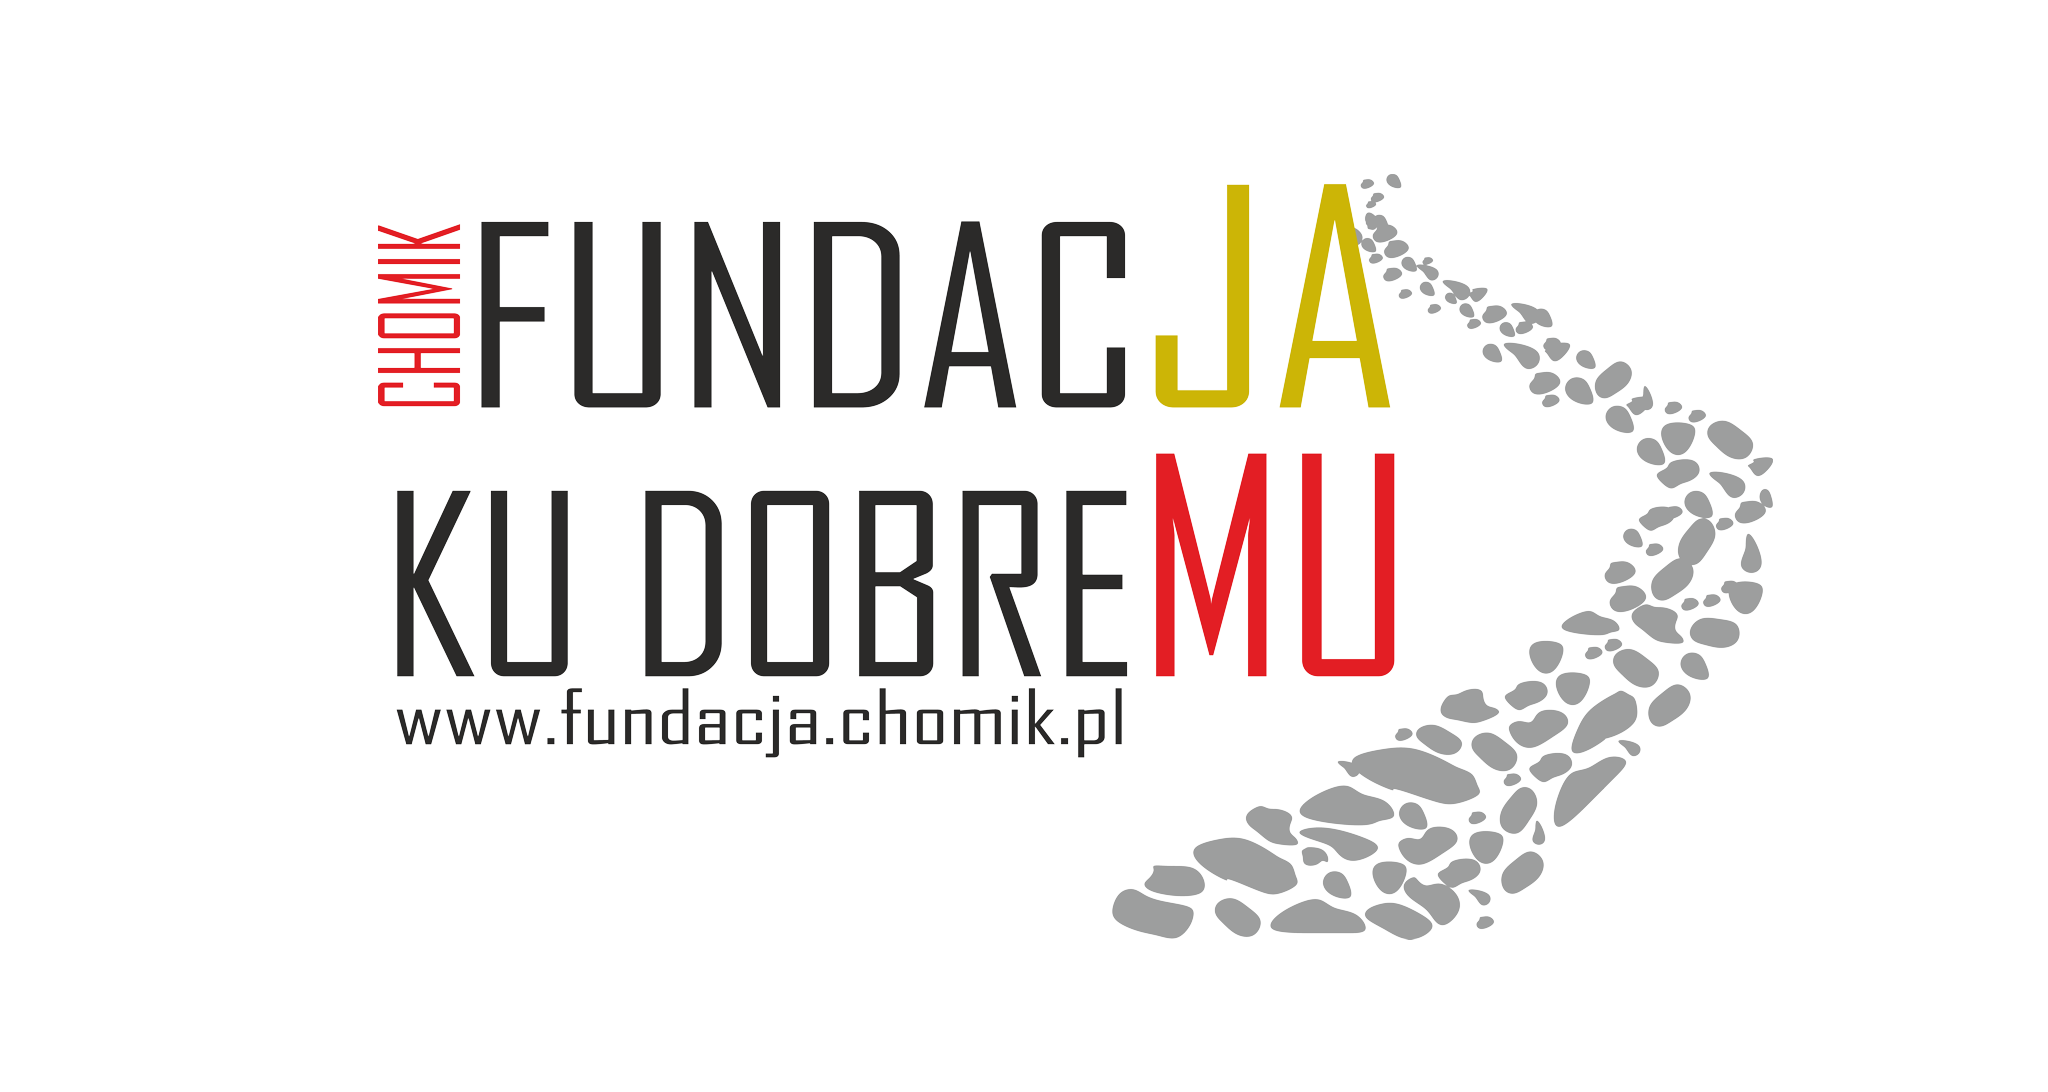 Fundacja Chomik Ku Dobremu